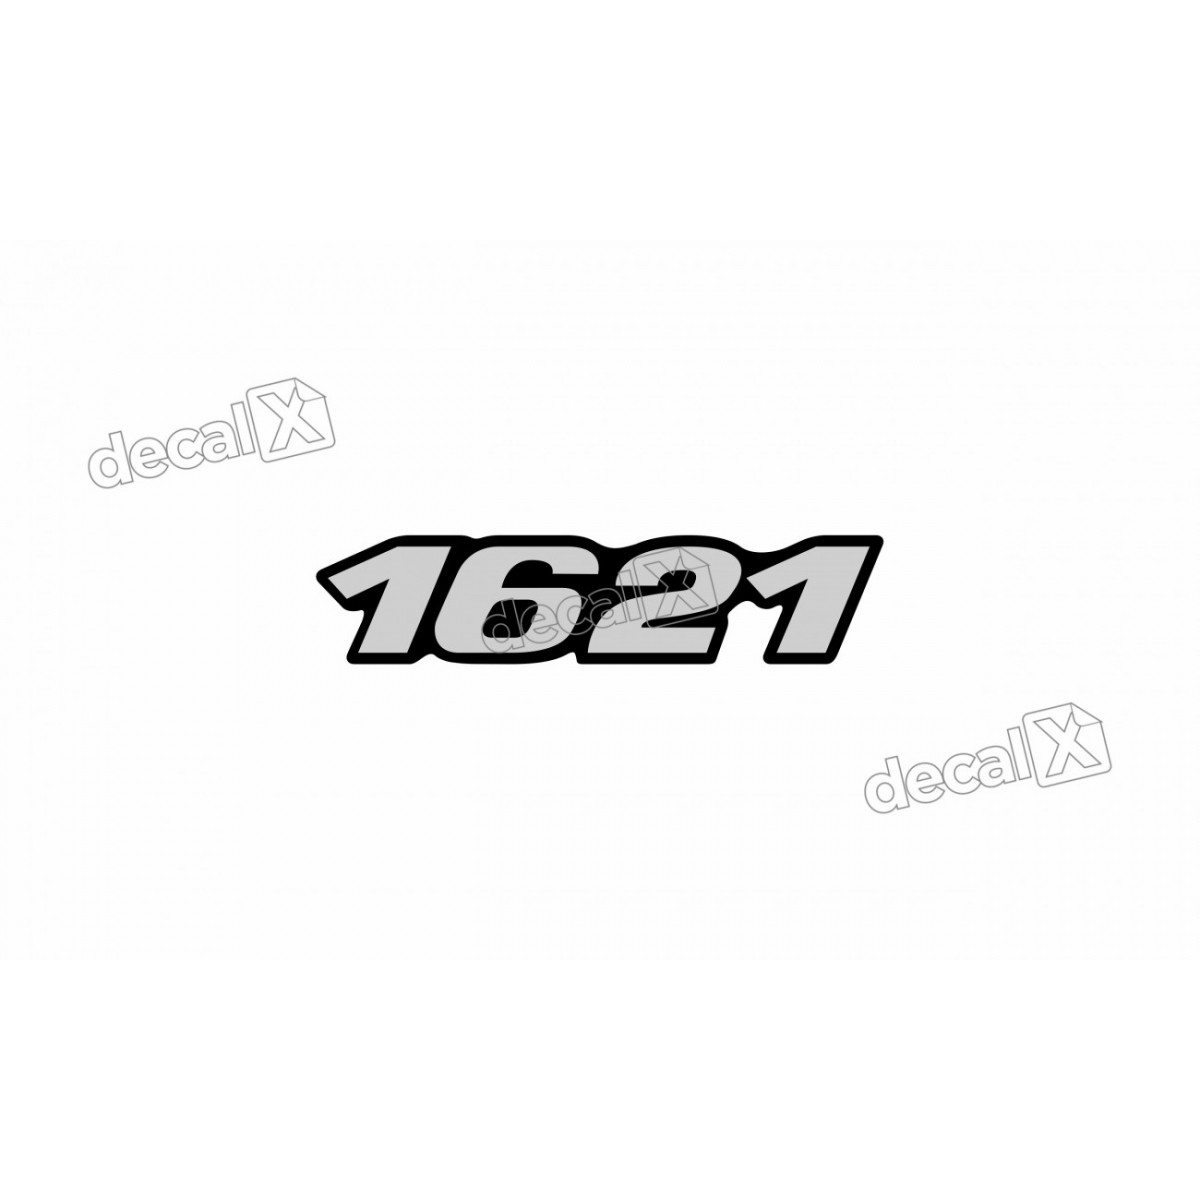 Adesivo Emblema Resinado Mercedes 1621 Cm48 Decalx